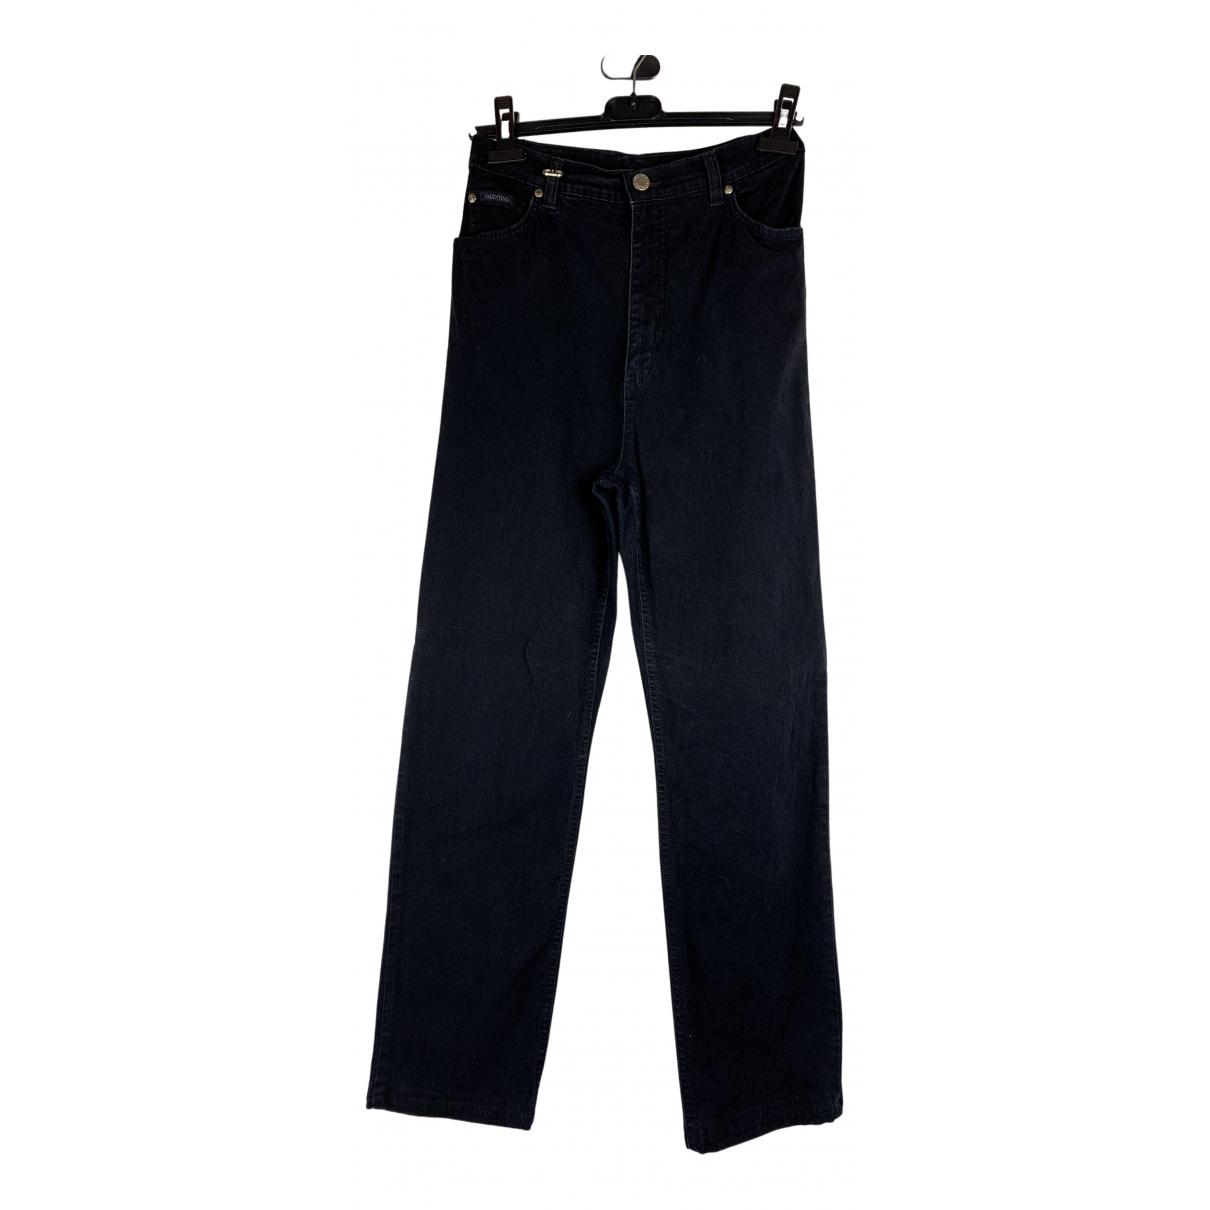 Valentino Garavani N Black Cotton Jeans for Women 28 US